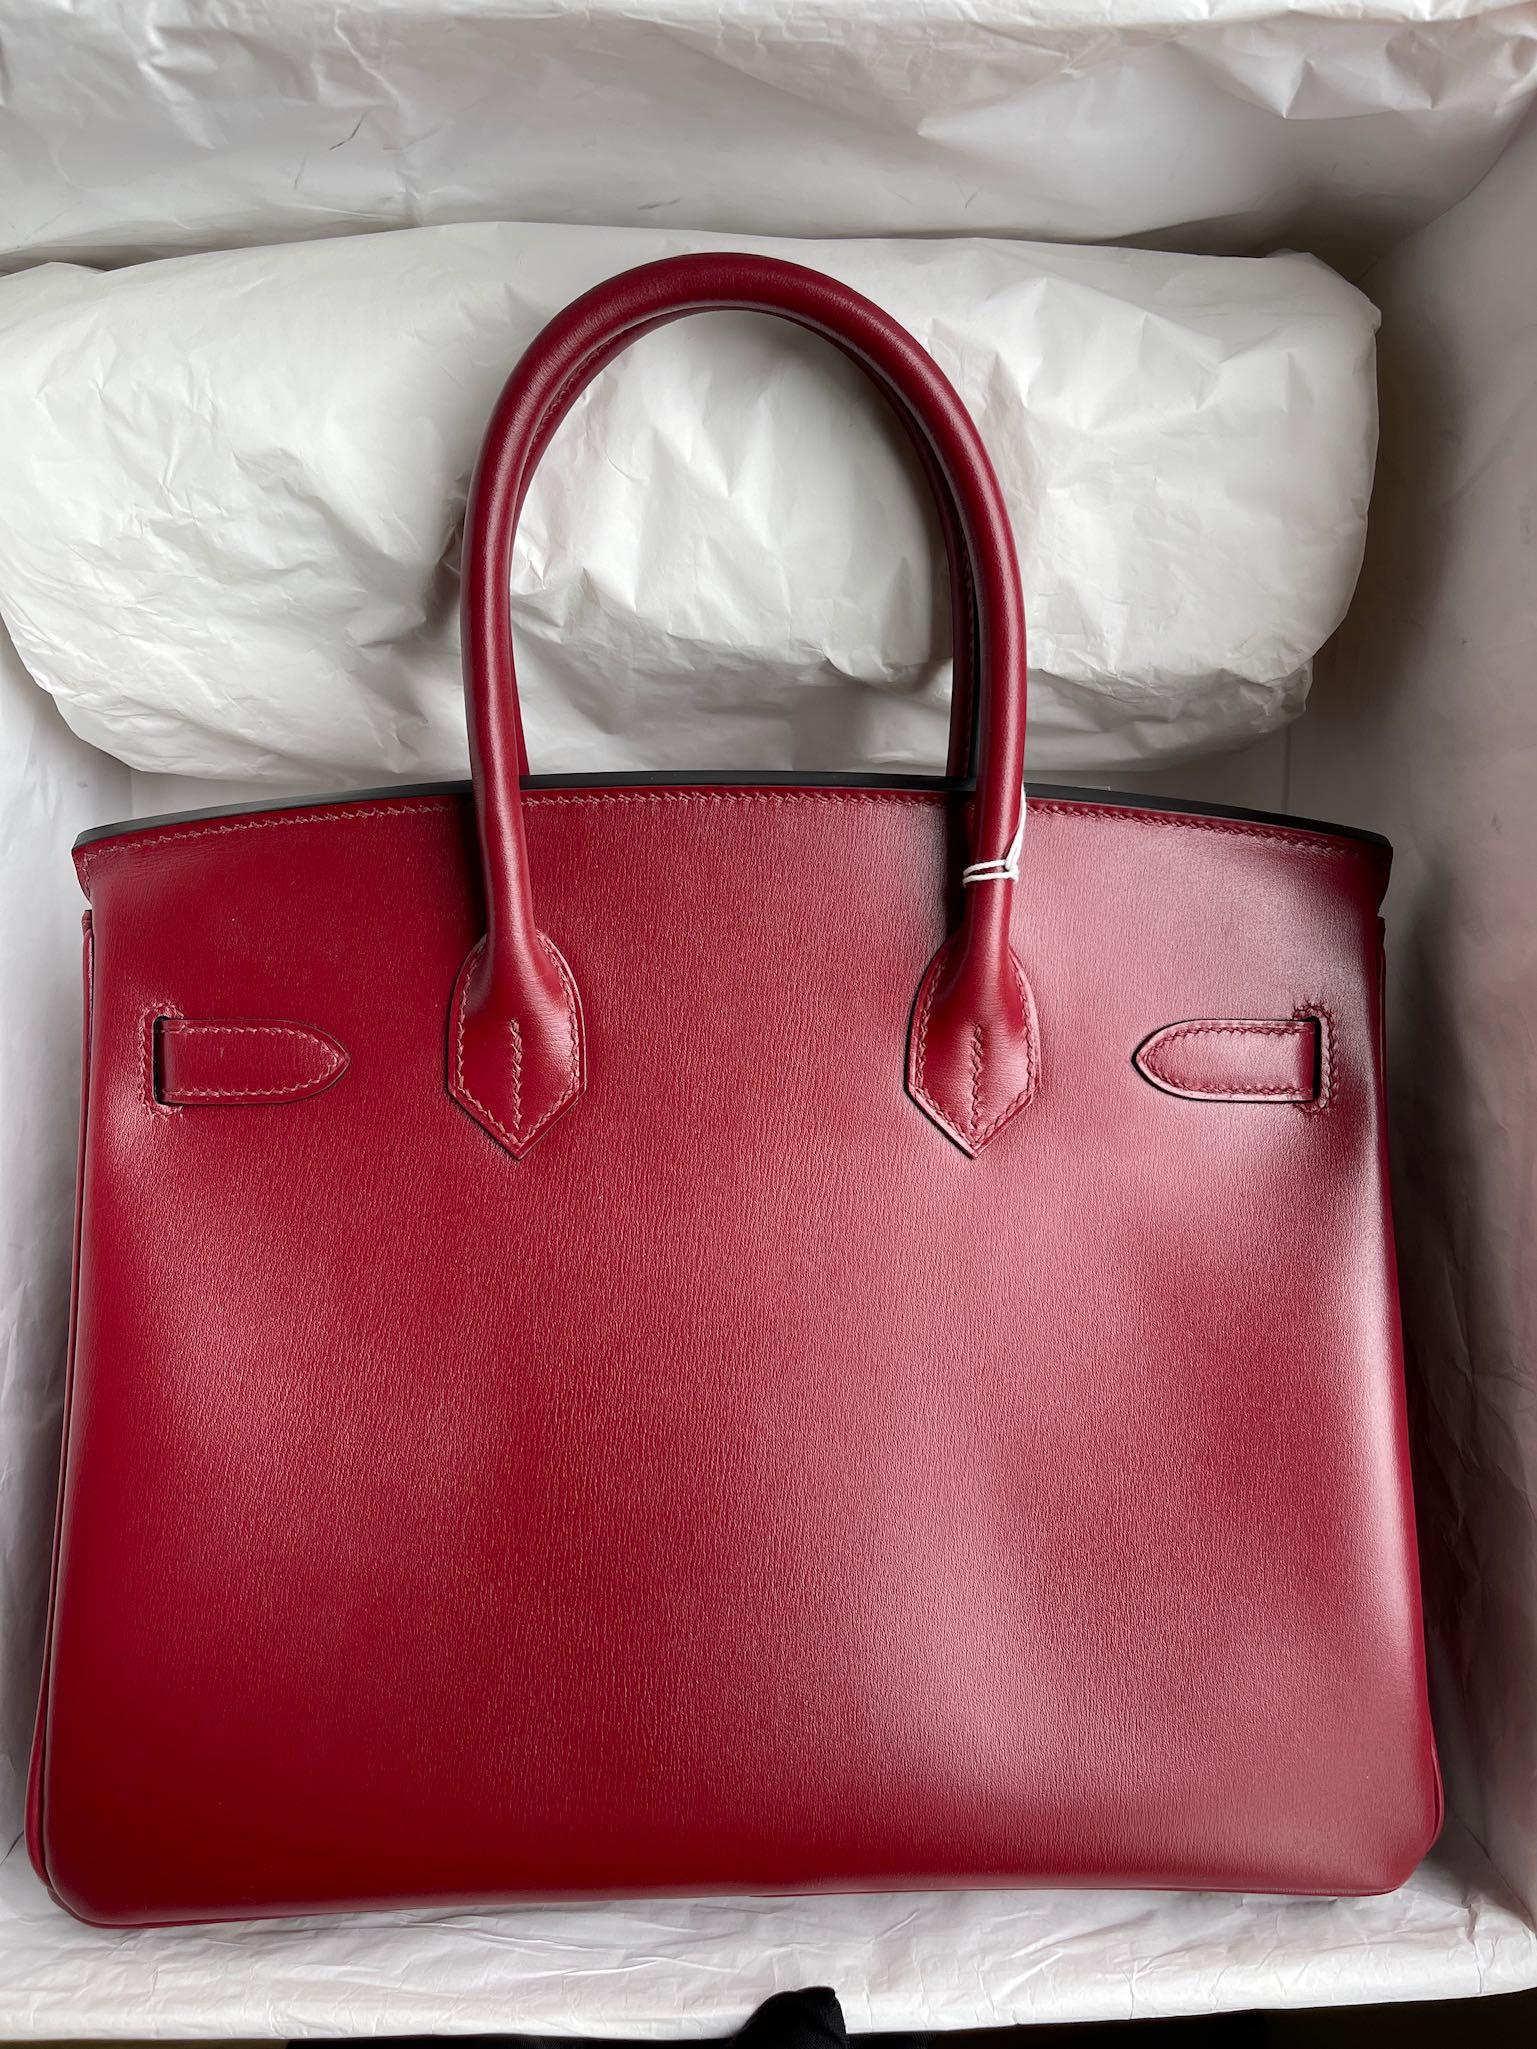 Hermès(爱马仕)Birkin 铂金包 Boxcalf 爱马仕红 Rouge H 金扣 30cm 顶级手缝 定制